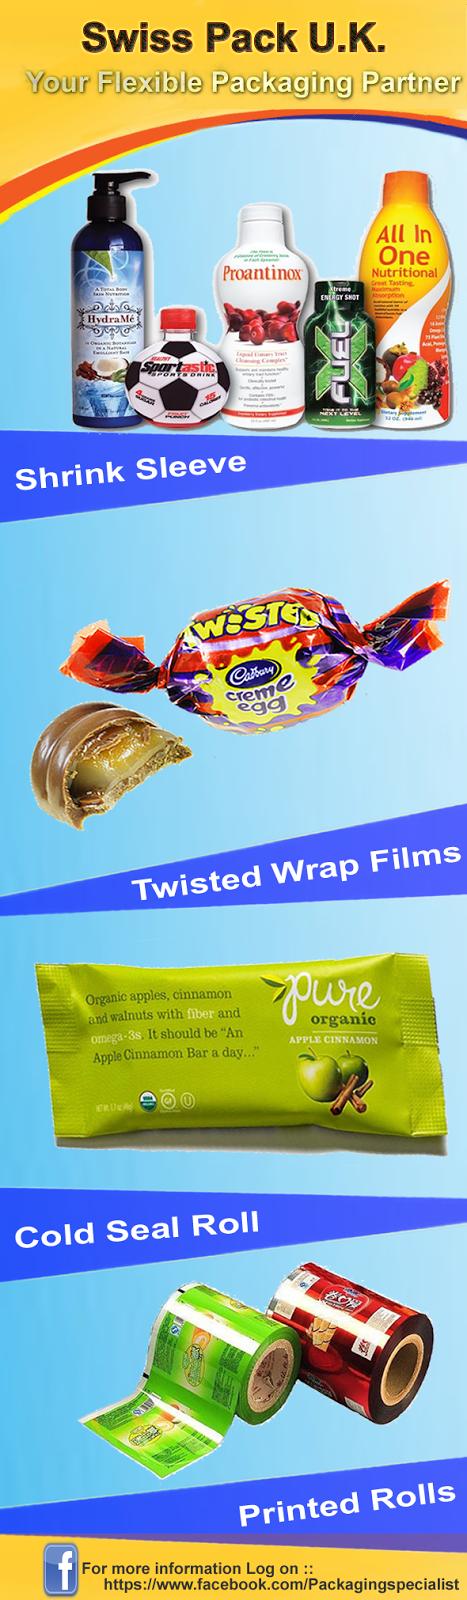 Swiss Pack - Your Flexible Packaging Partner